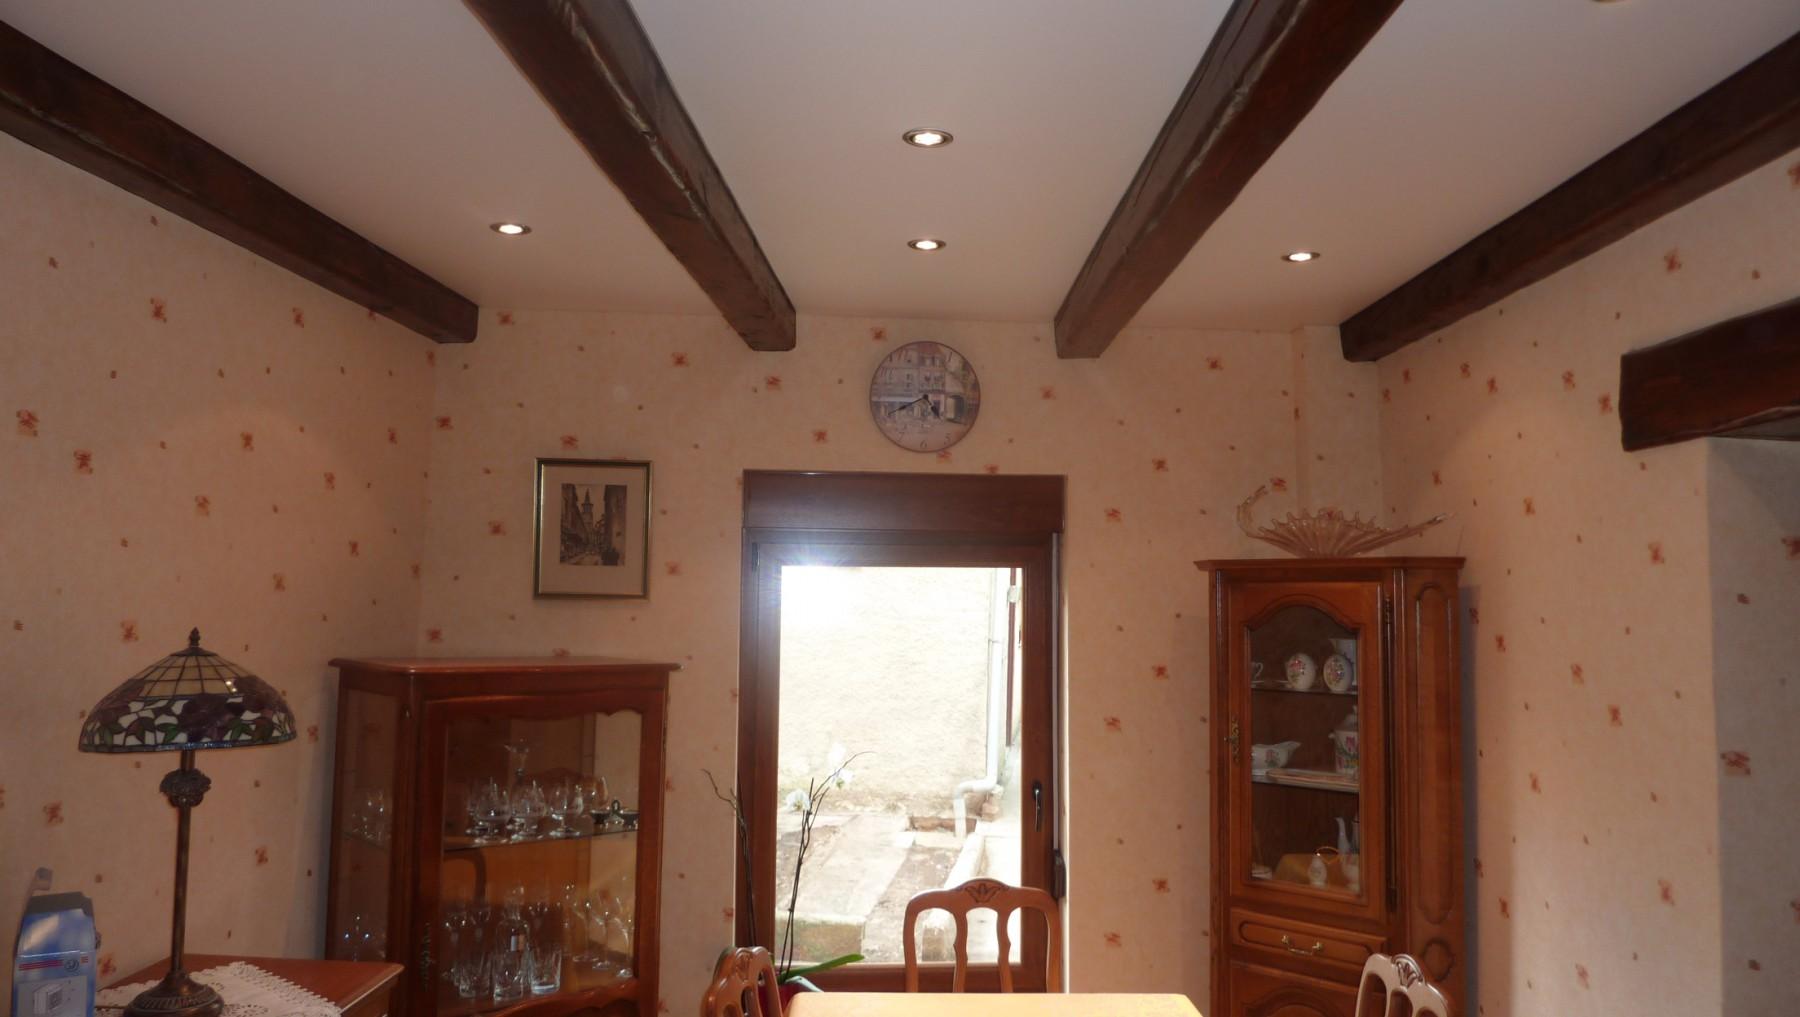 Wwwplafond Tendufr